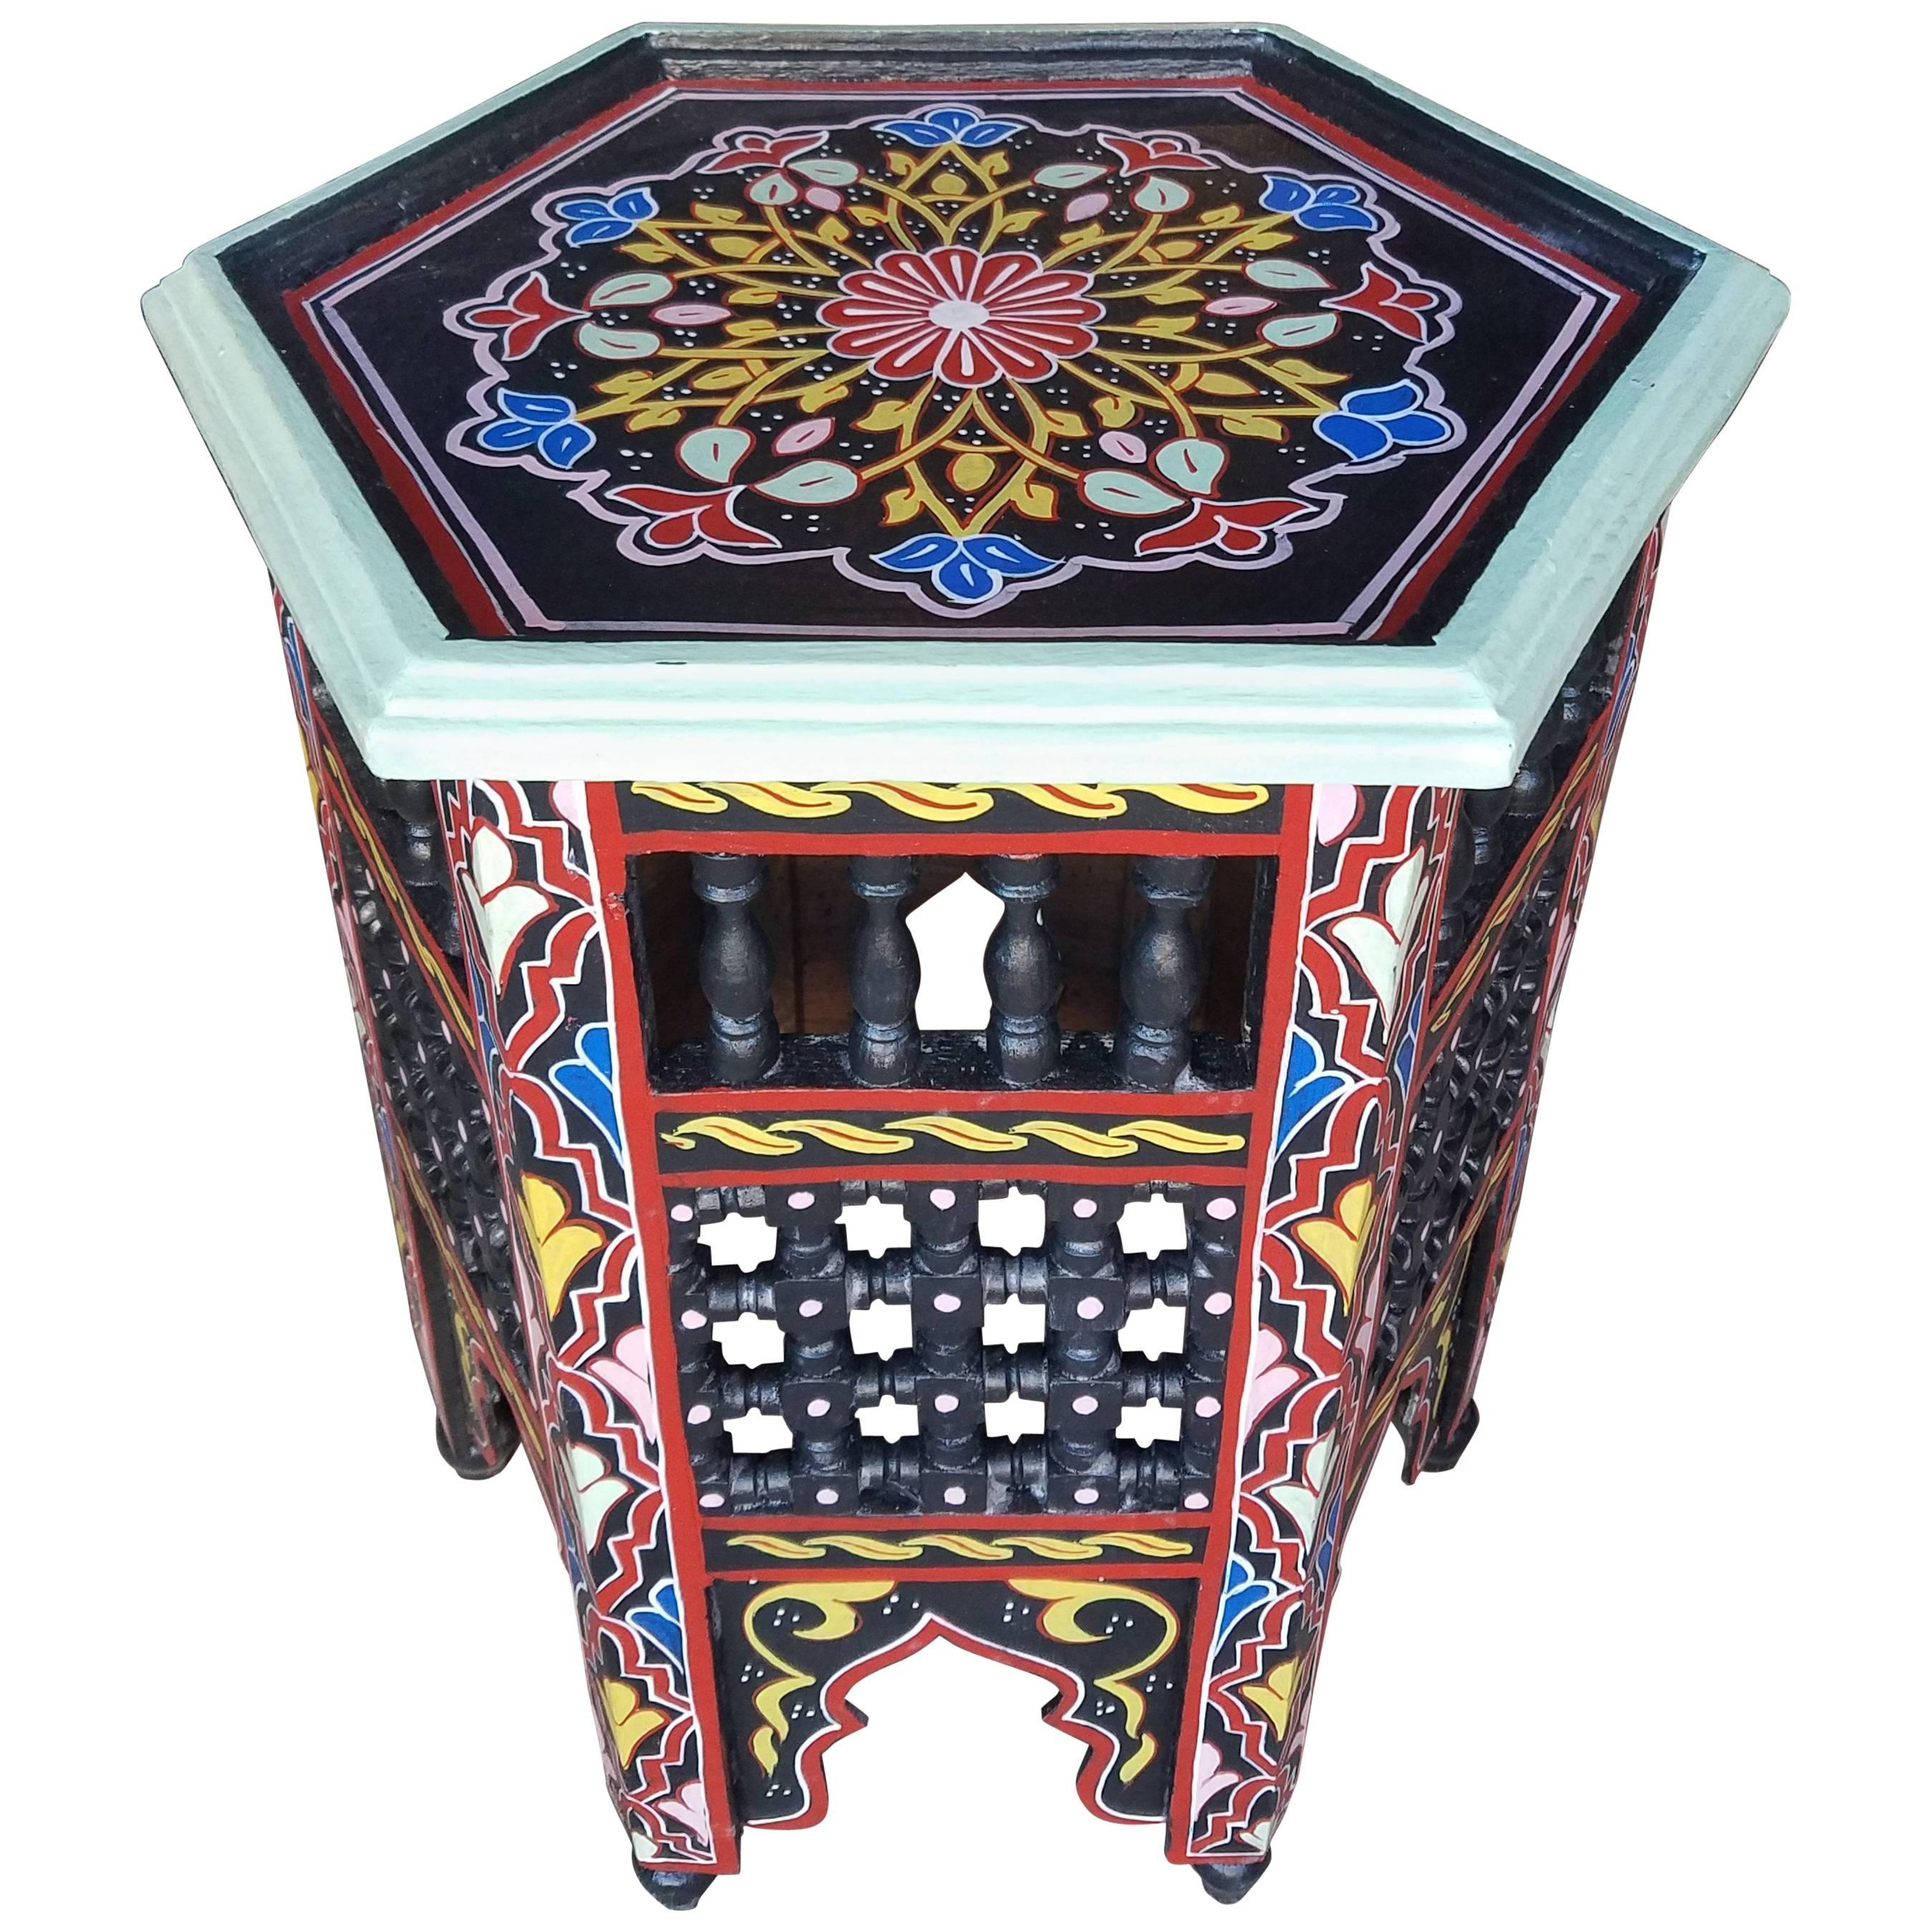 Black Hexagonal Hand Painted Table, Marrakech